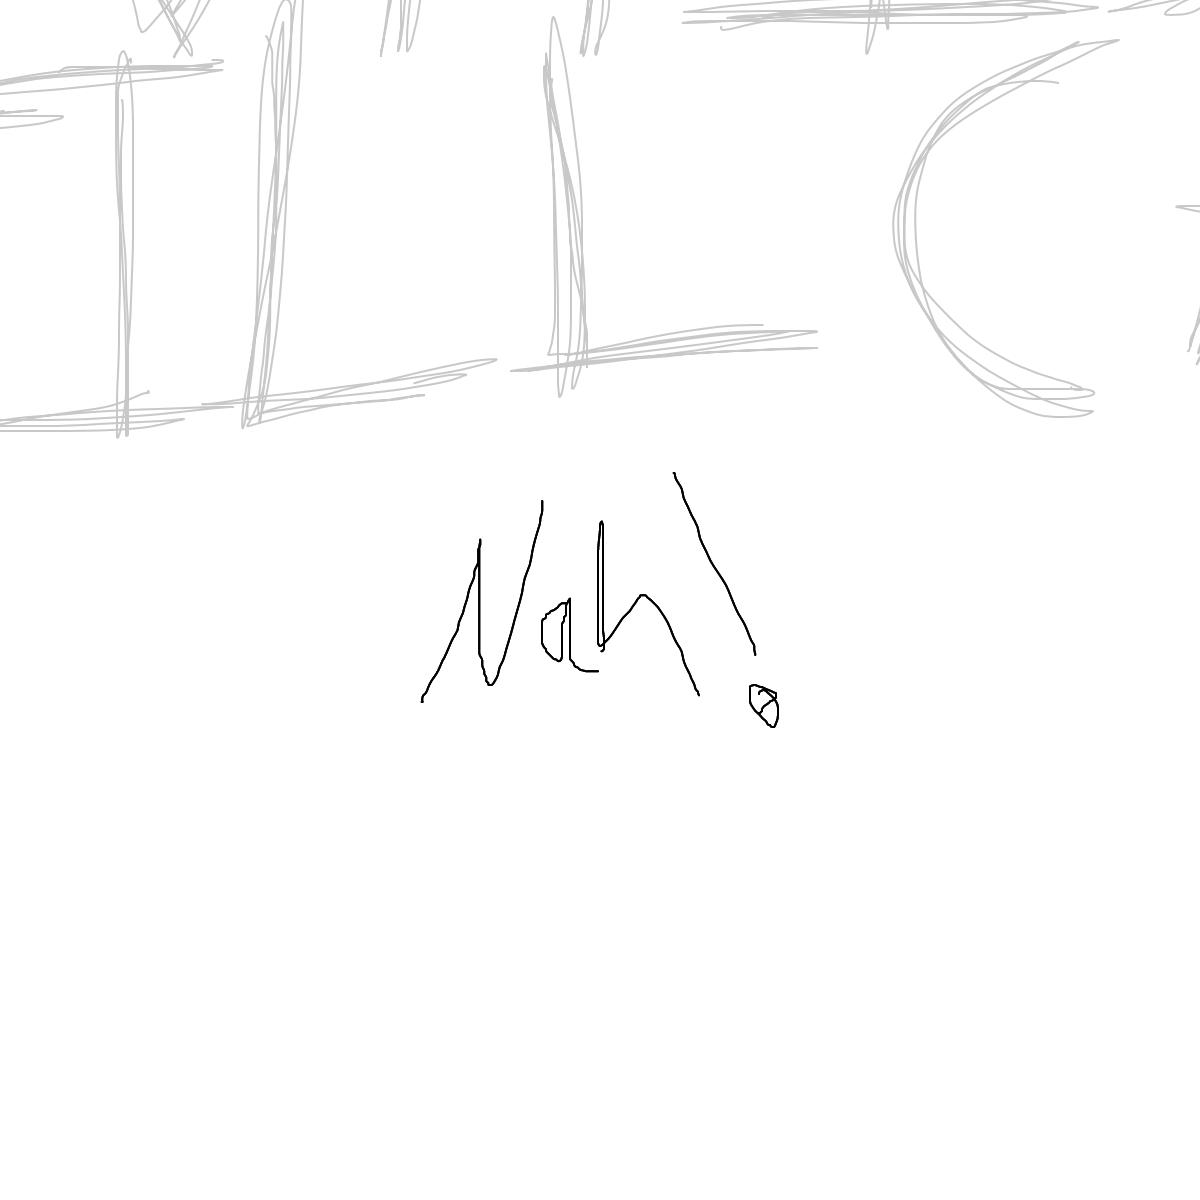 BAAAM drawing#22969 lat:47.2371292114257800lng: -93.5302124023437500